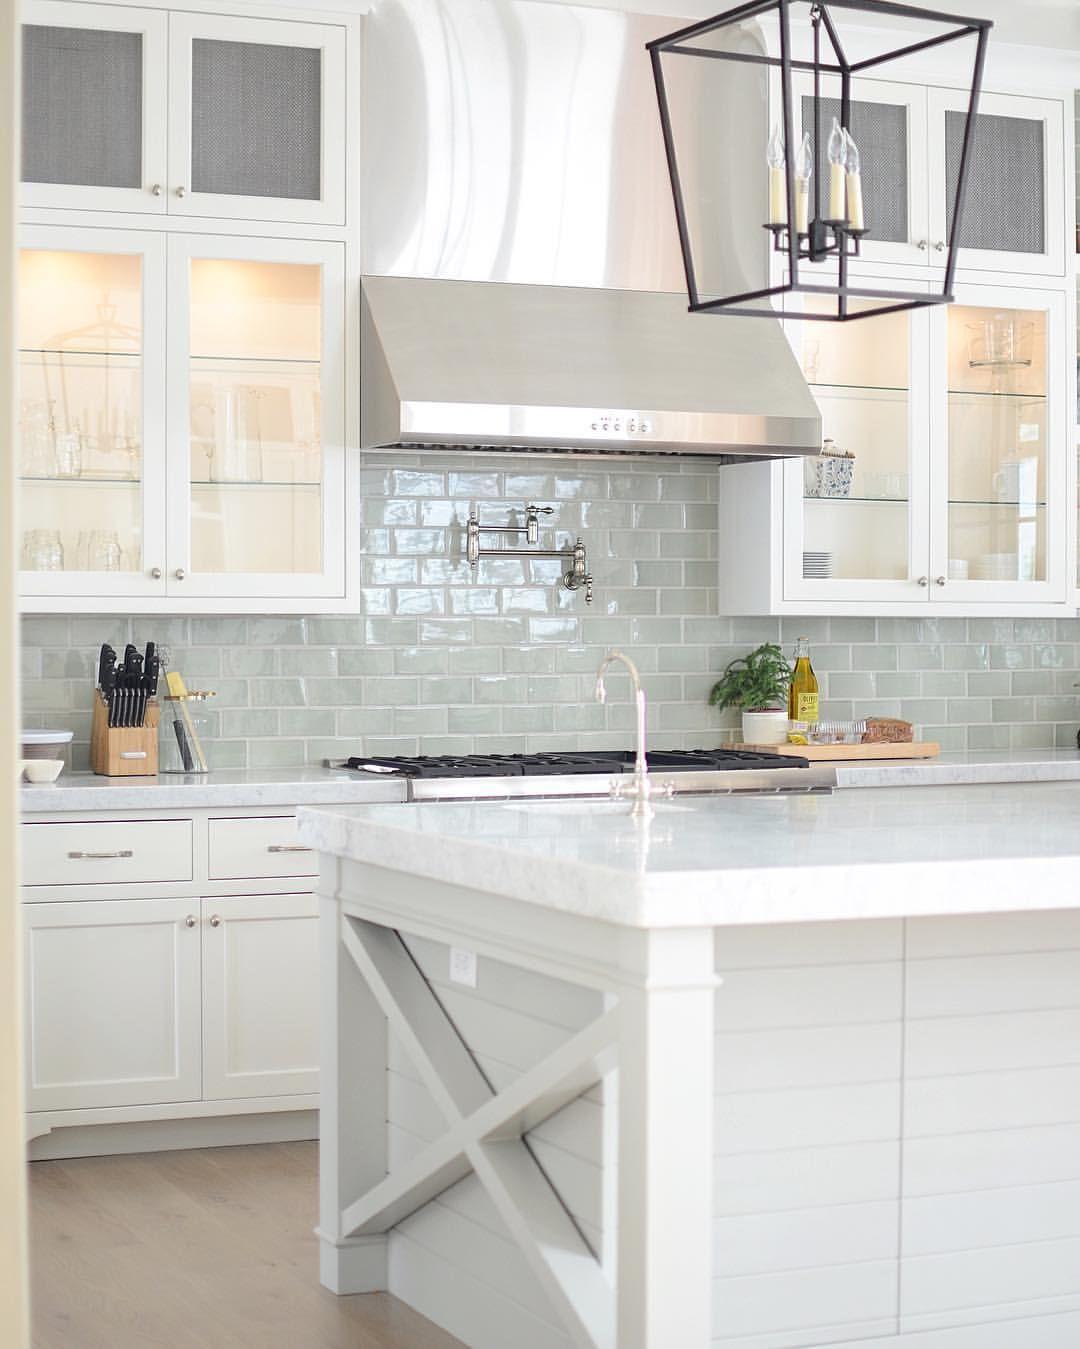 Bright white kitchen with pale blue subway tile backsplash